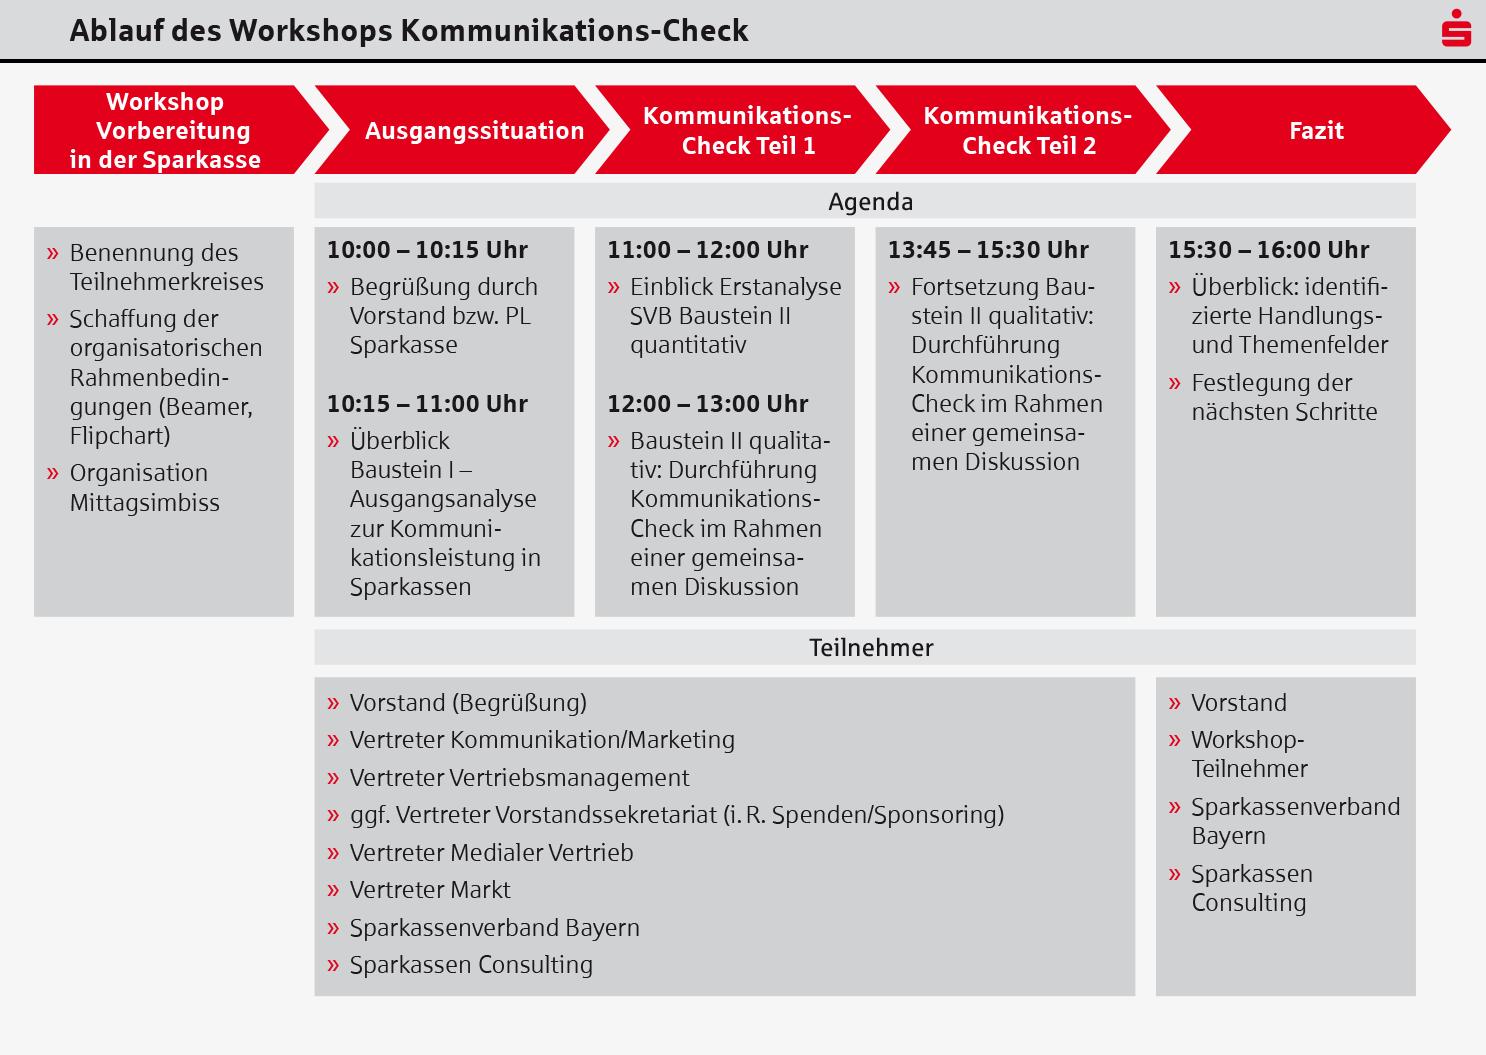 Sparkassen Consulting GmbH